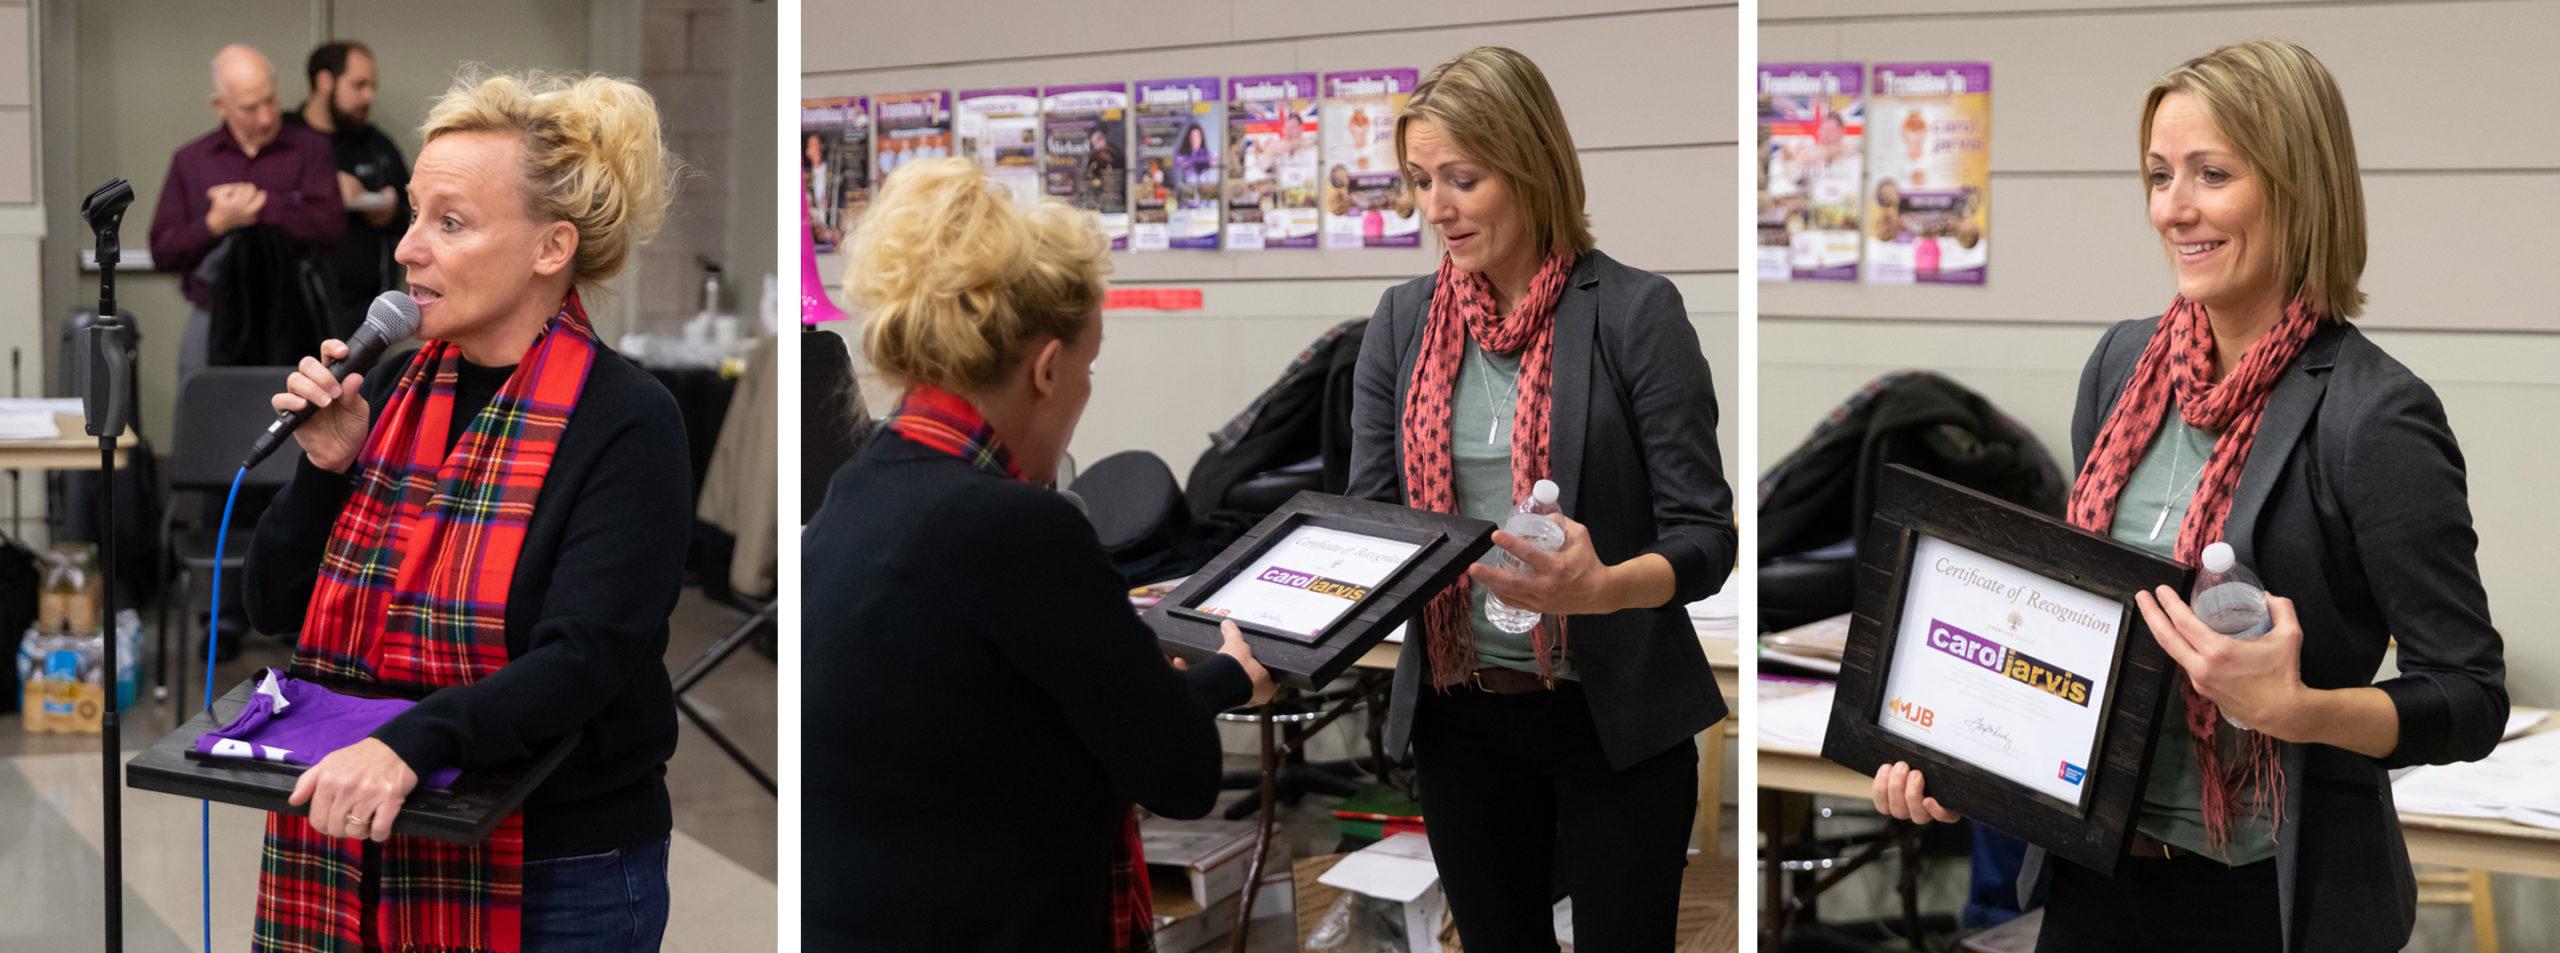 Natalie Massing of the American Cancer Society welcomes warrior/survivor Carol Jarvis to Harrisonburg, VA.